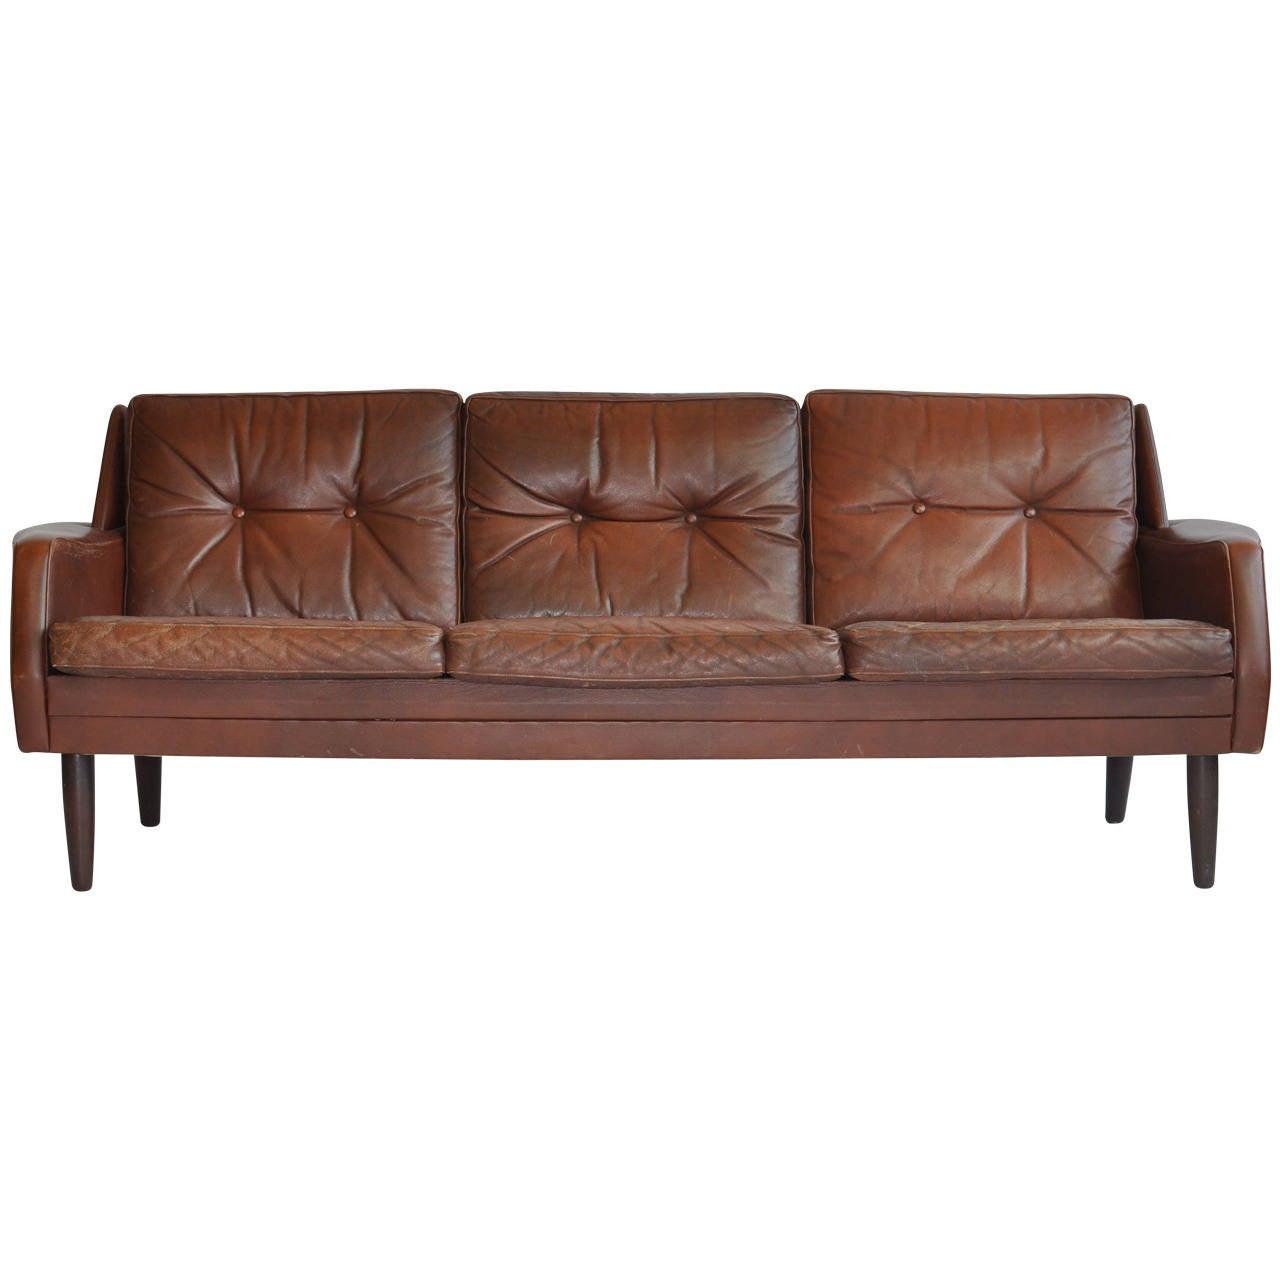 Danish leather sofa at 1stdibs for Scandinavian sofa